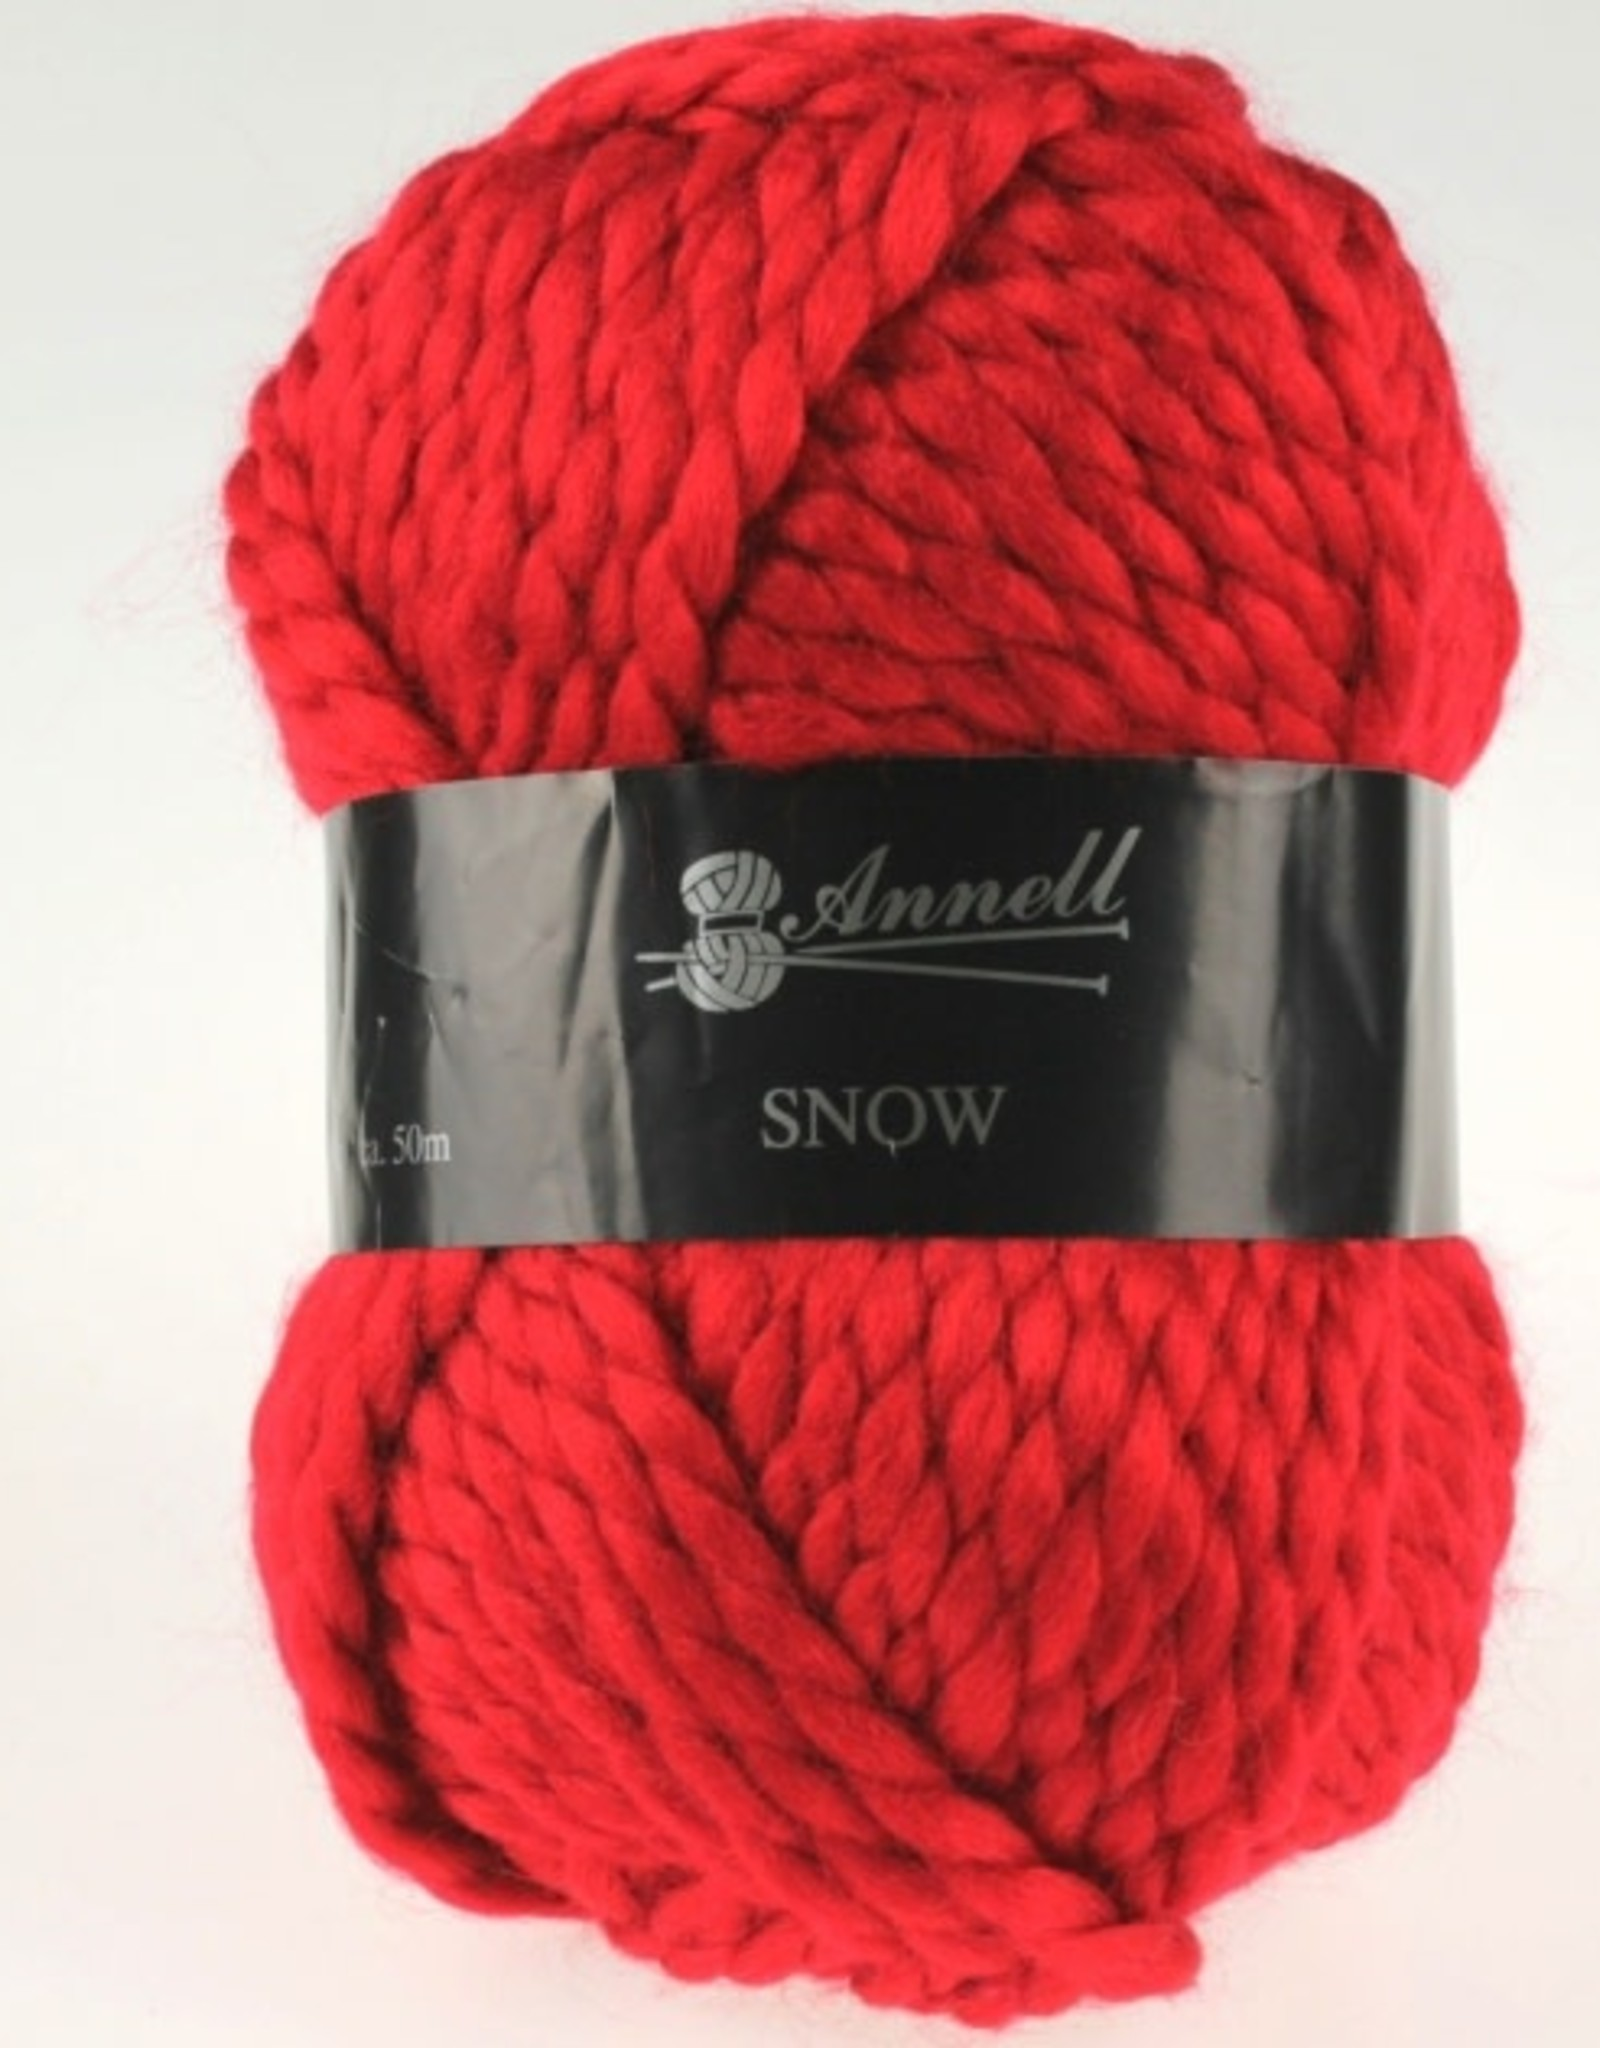 Annell Annell Snow 3912